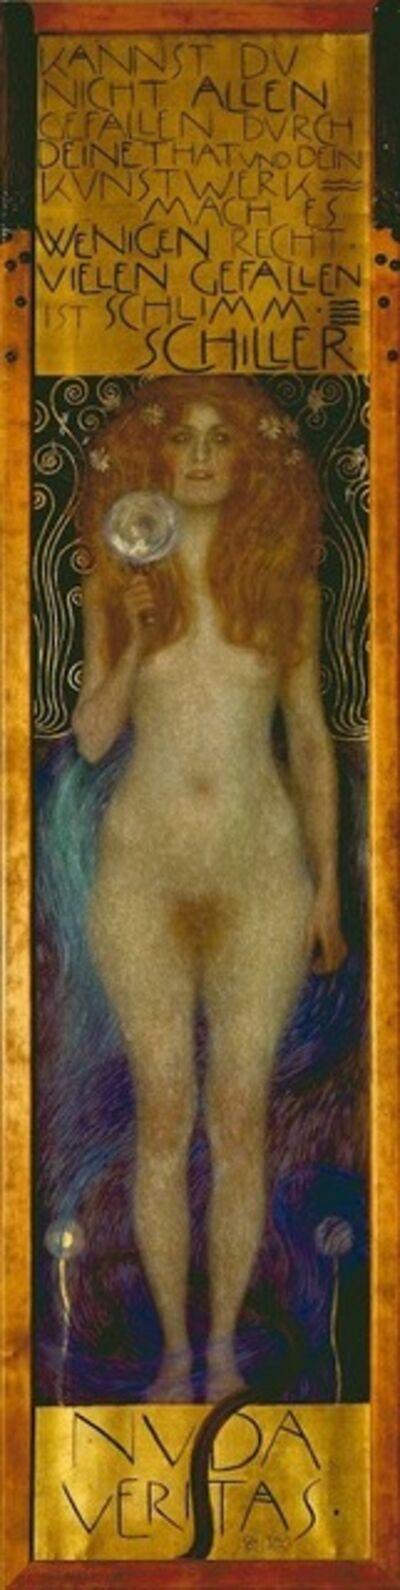 Gustav Klimt, 'Nuda Veritas', 1897